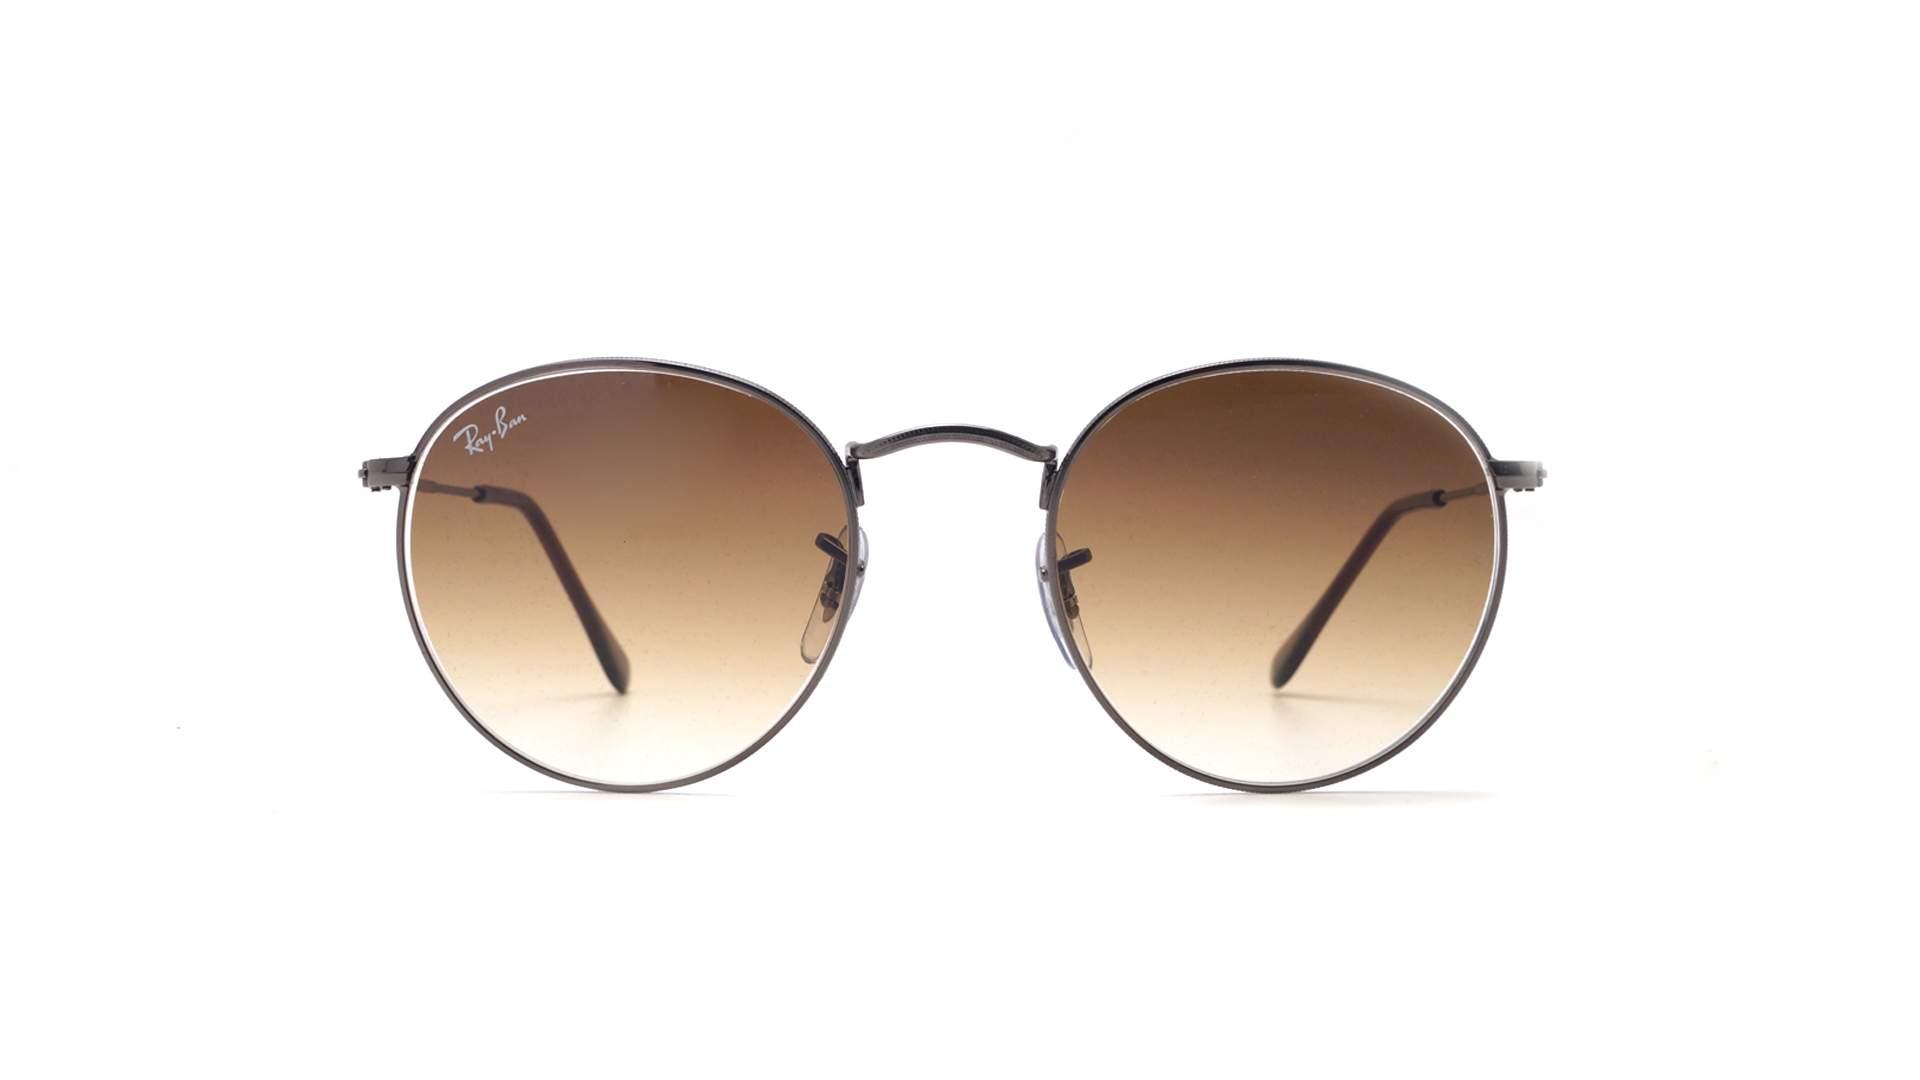 86f4f44ecb Sunglasses Ray-Ban Round metal Gun Flat Lenses Grey RB3447N 004 51 50-21  Medium Gradient